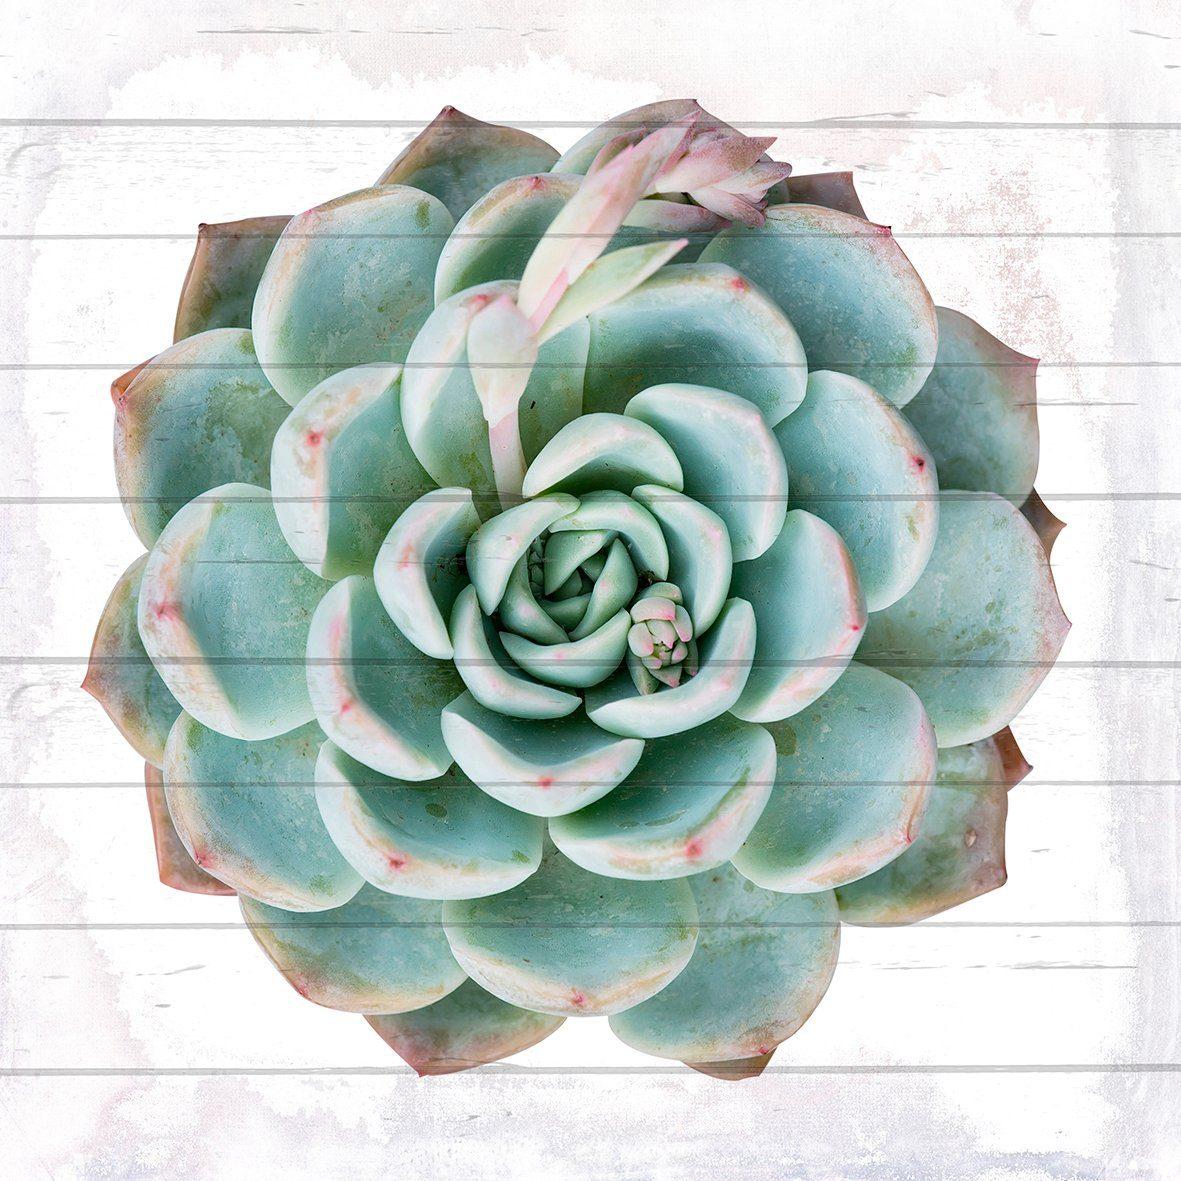 QUEENCE Holzbild »Kaktuspflanze«, 40x40 cm Echtholz